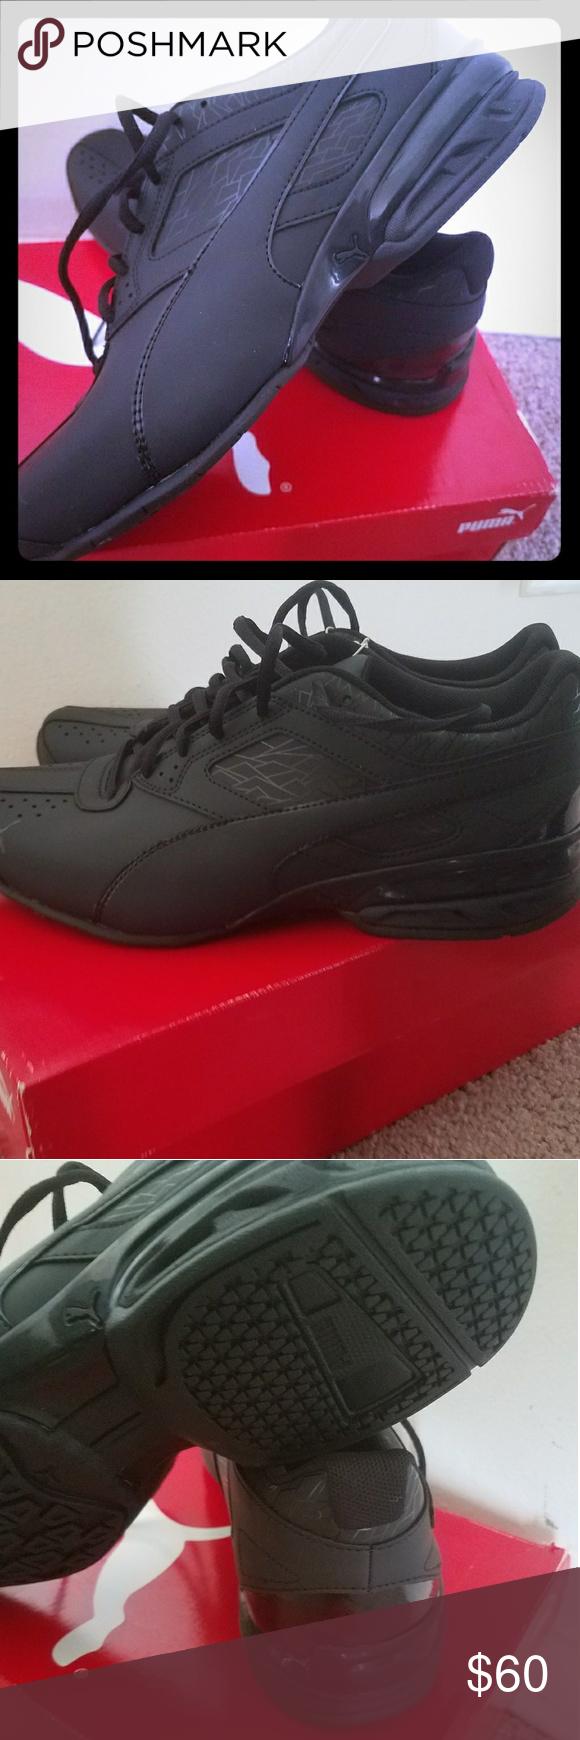 Men size 9.5 puma tazon 6 fracture (black) New pair of shoes! Puma Shoes Athletic Shoes